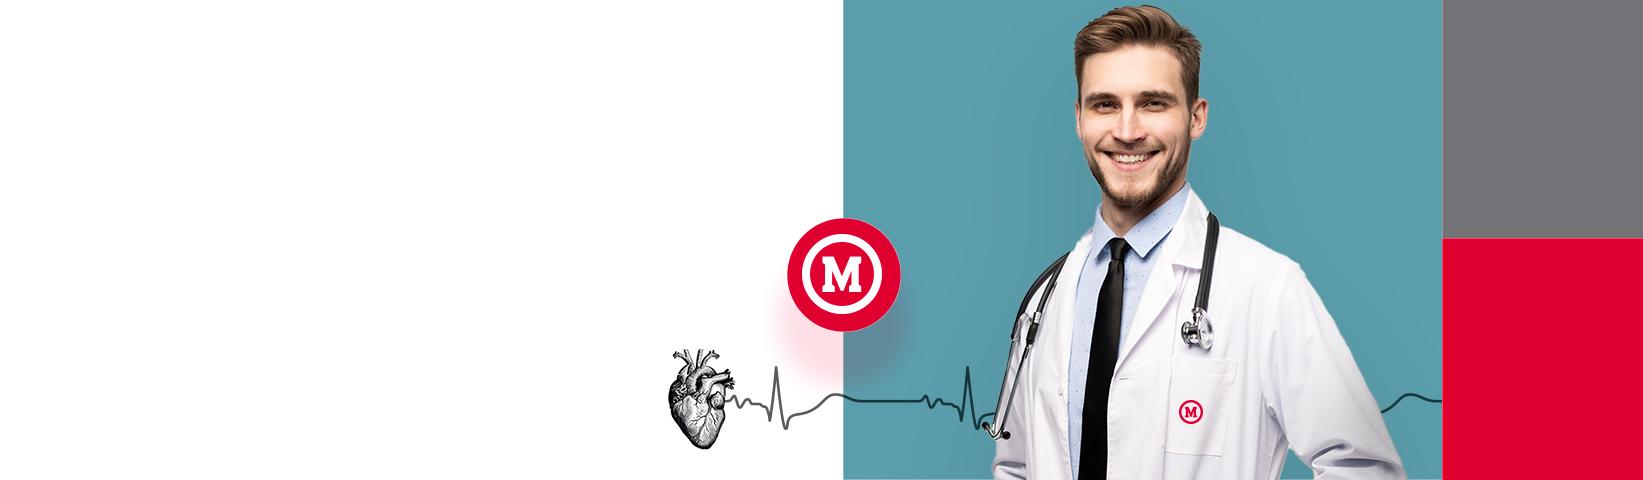 Processo Seletivo Medicina 2022